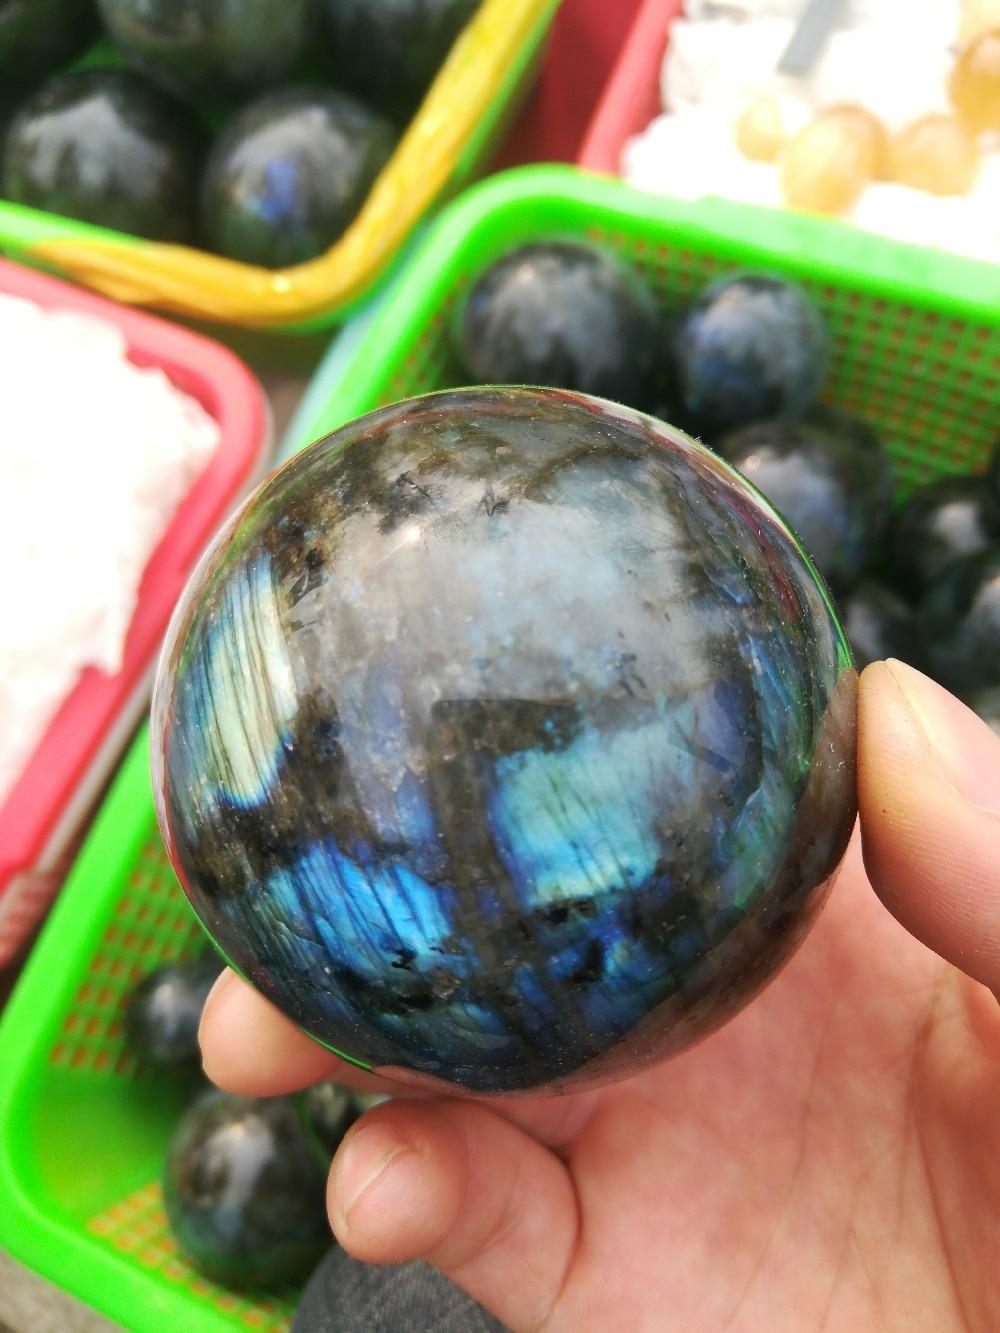 60mm NATURAL labradorite quartz crystal bola esfera cura + suporte